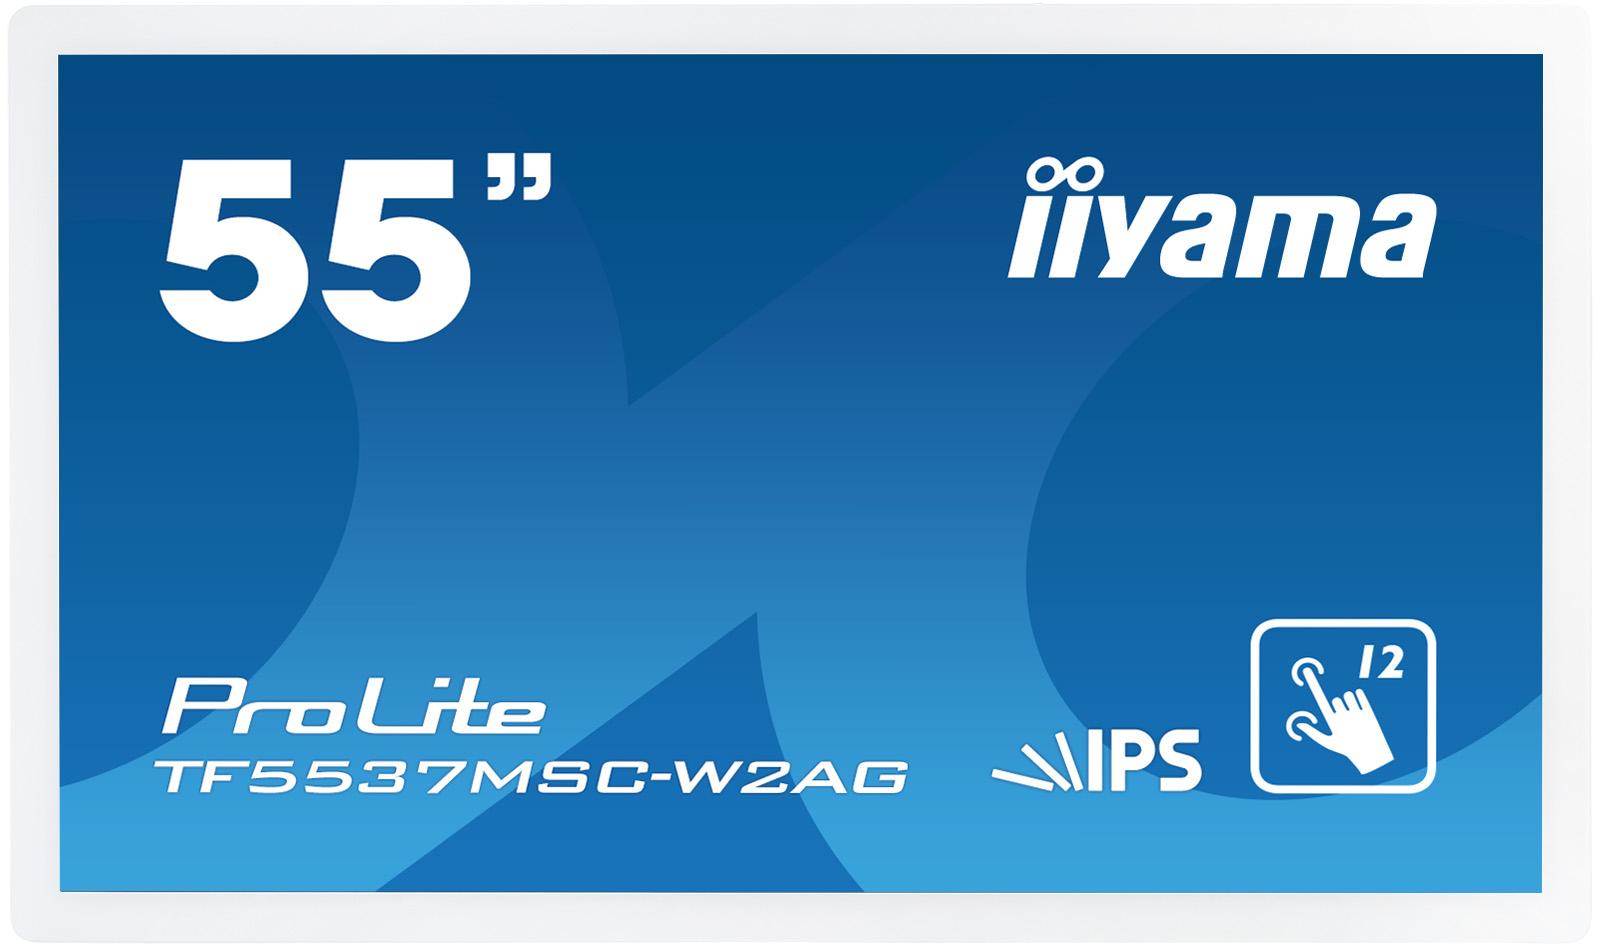 Iiyama ProLite TF5537MSC-W2AG - 138.8cm/55 Klasse LED-Display - mit Touchscreen